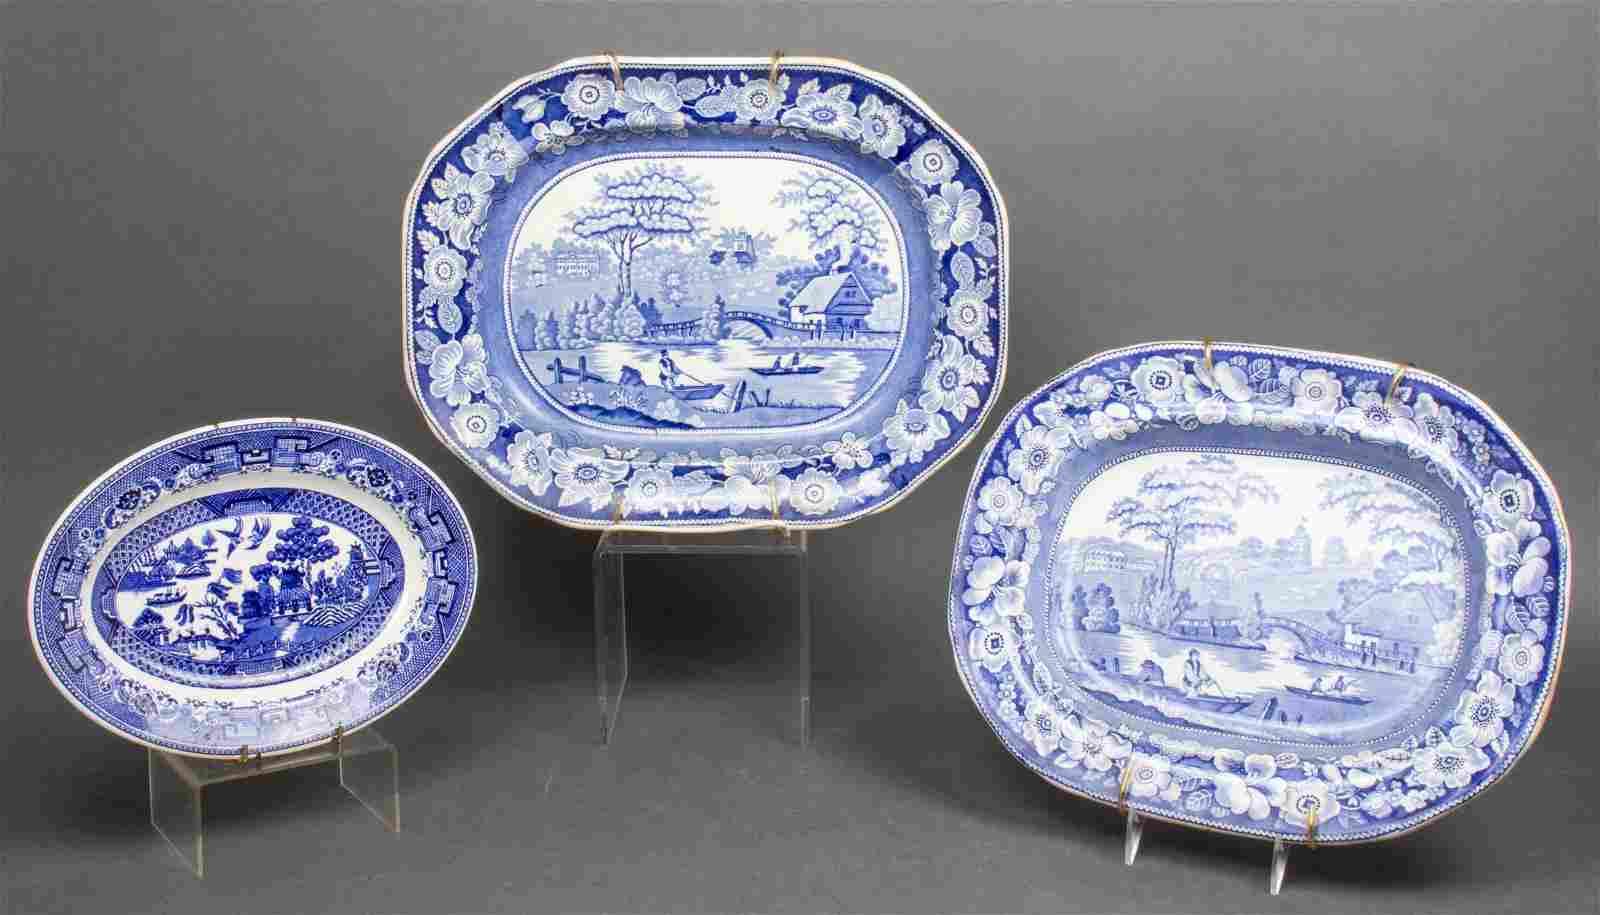 Staffordshire, Wedgwood Transferware Platters, 3